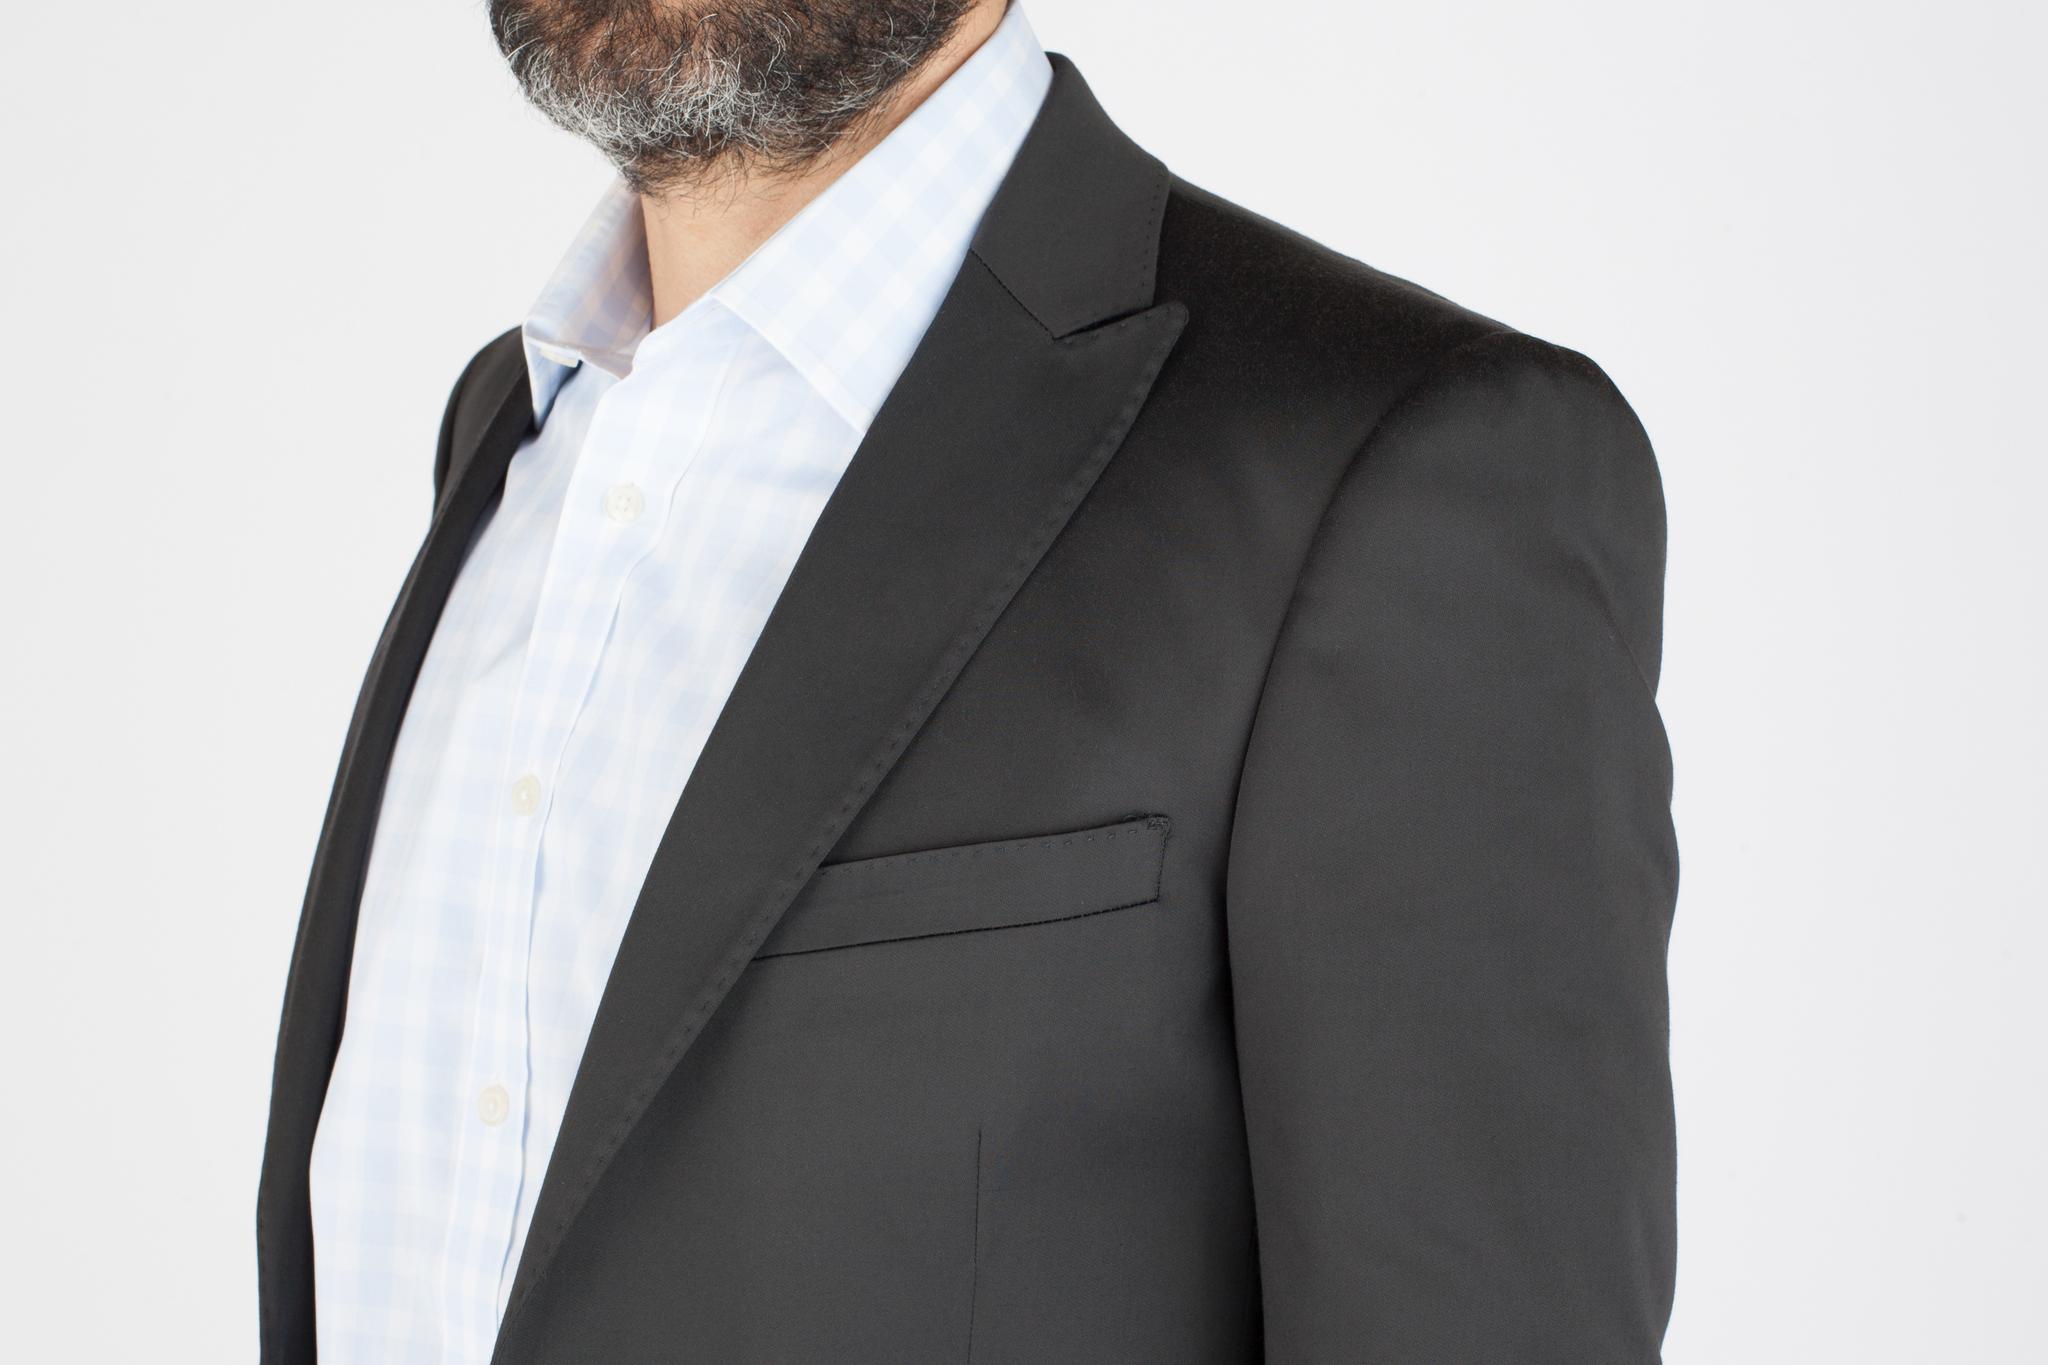 Тёмно-синий хлопковый костюм, нагрудный карман